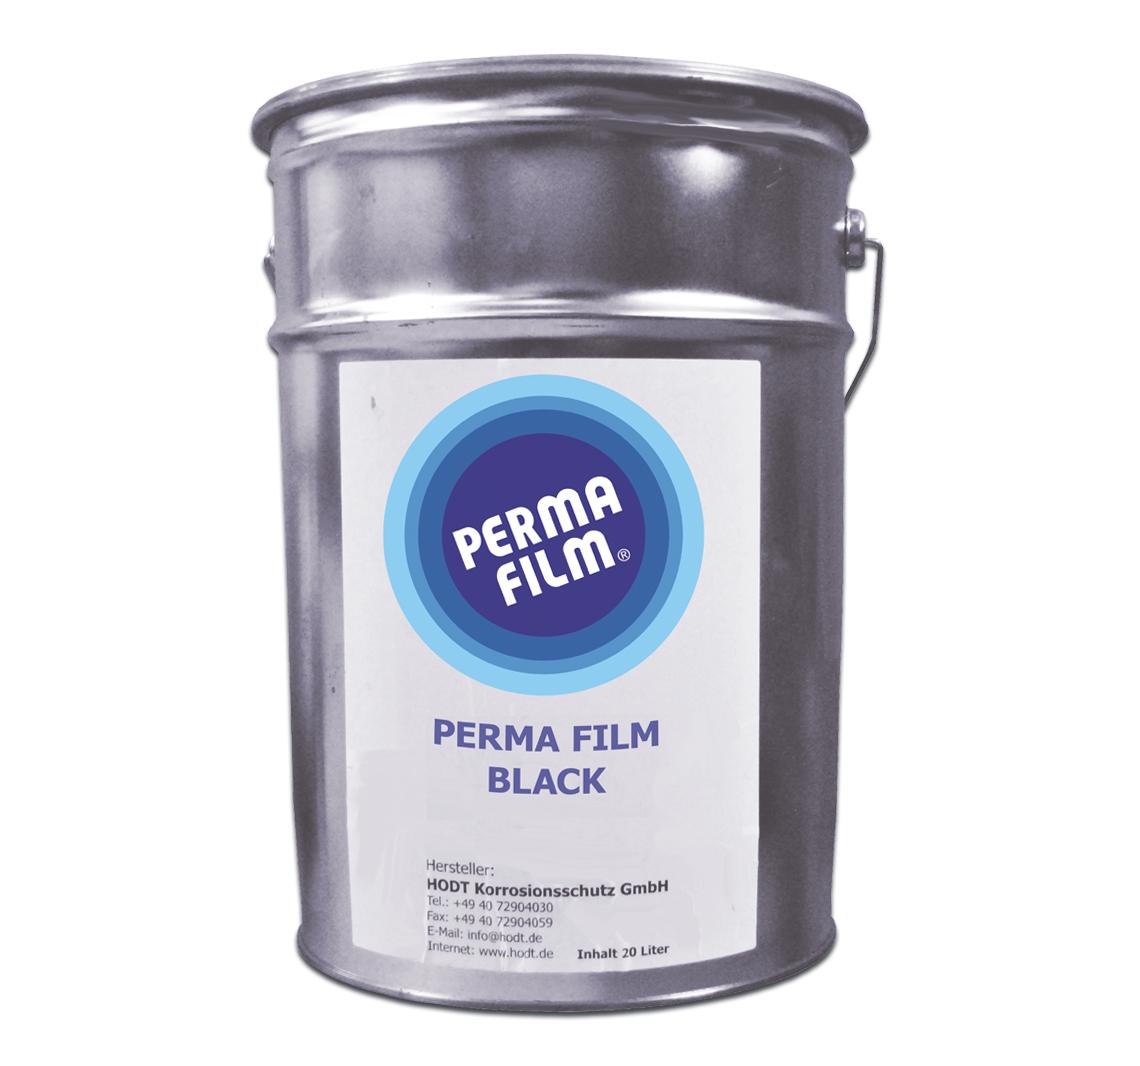 Perma Film black 20 liter